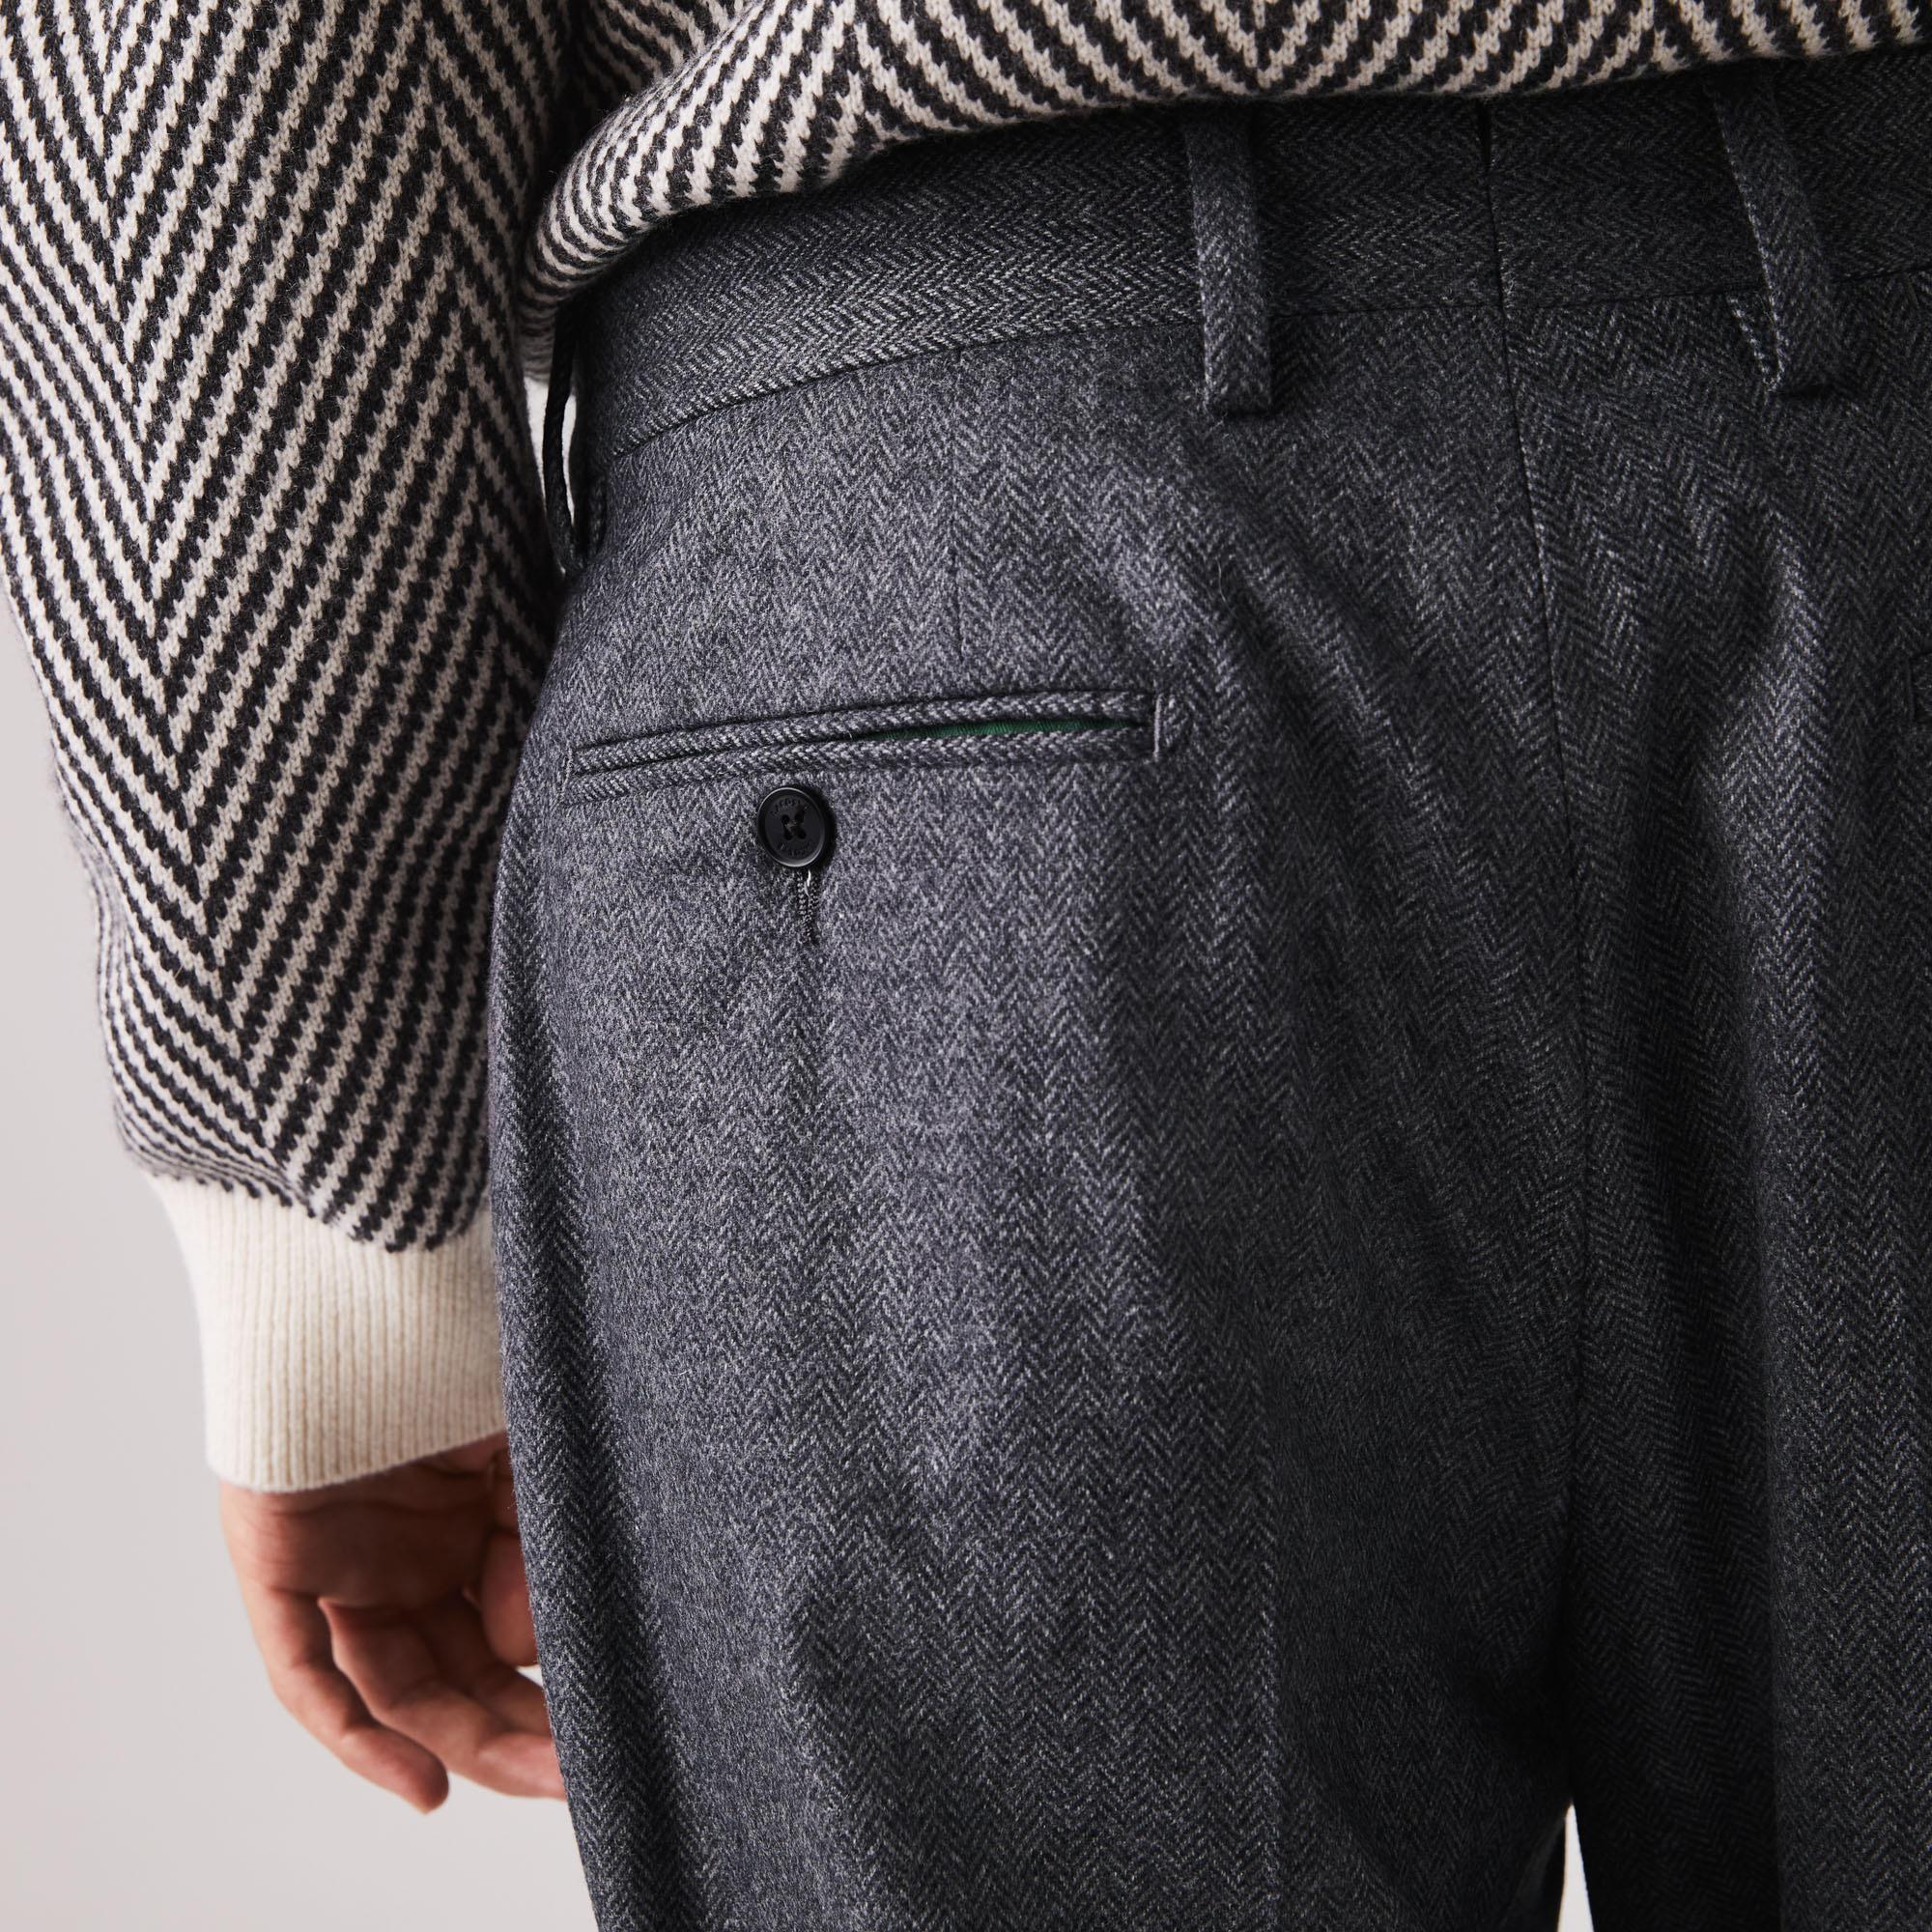 Lacoste Erkek Desenli Gri Pantolon